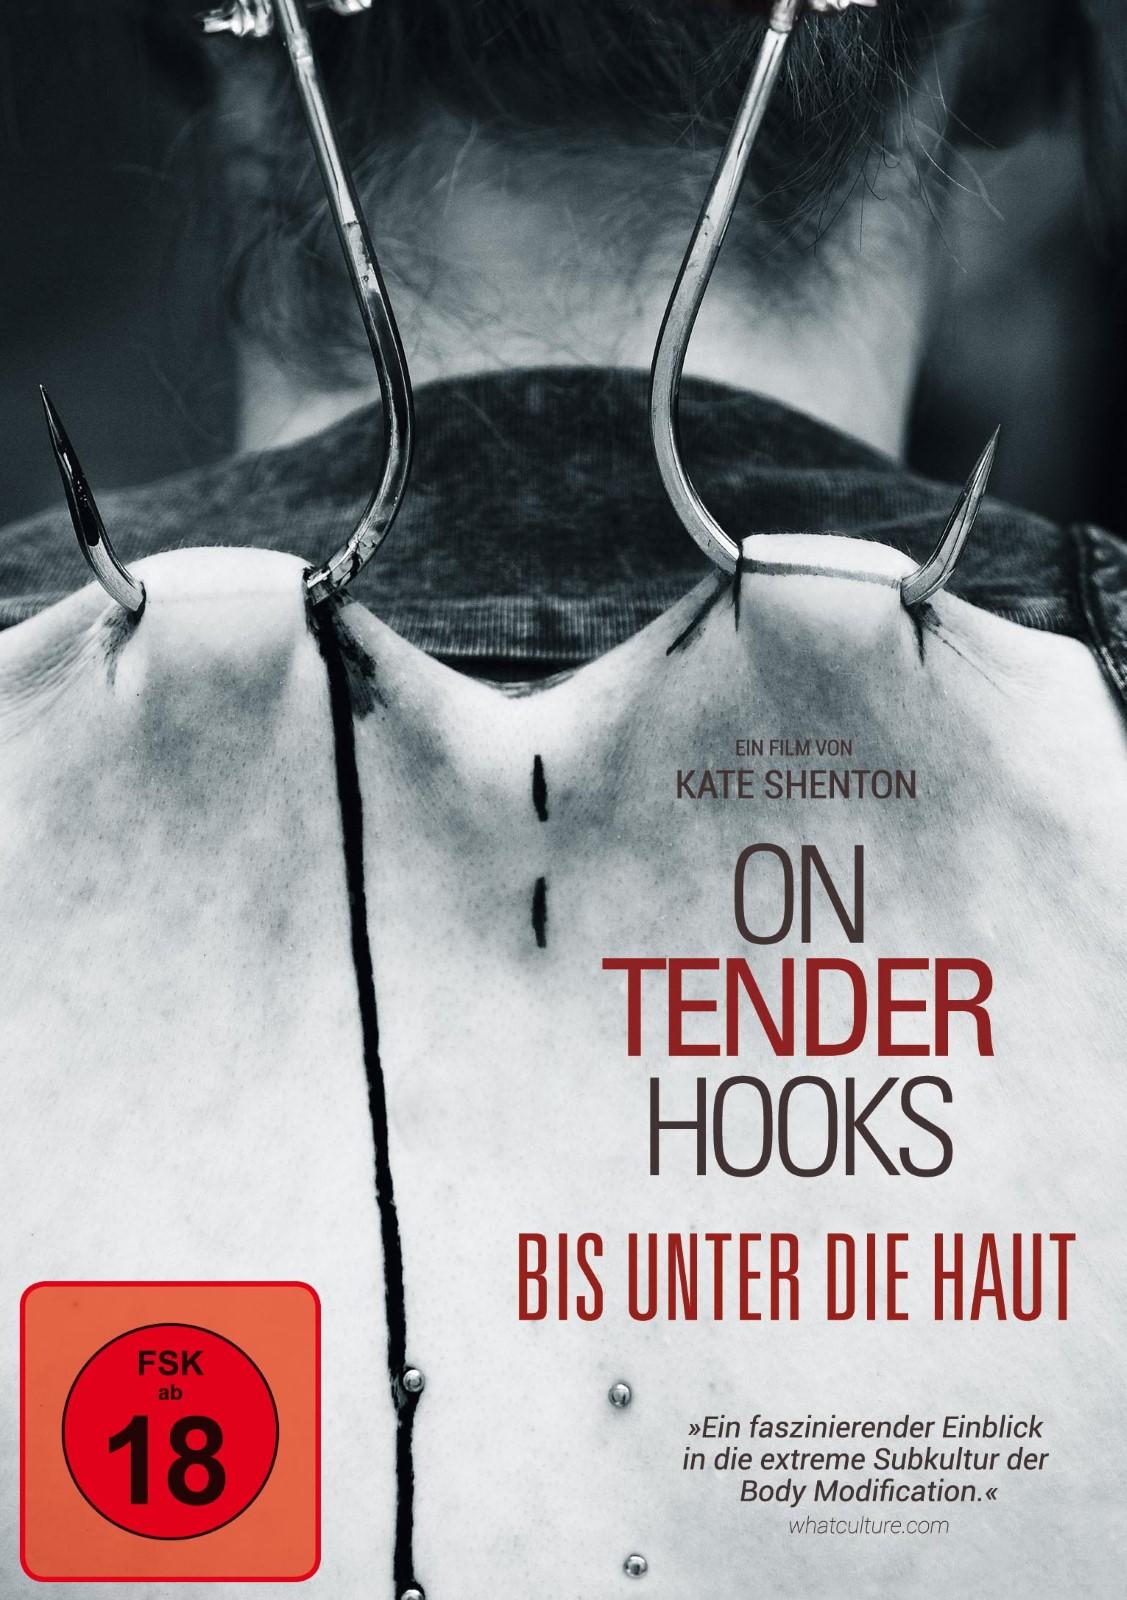 On Tender Hooks Bis Unter Die Haut Film 2013 Filmstarts De